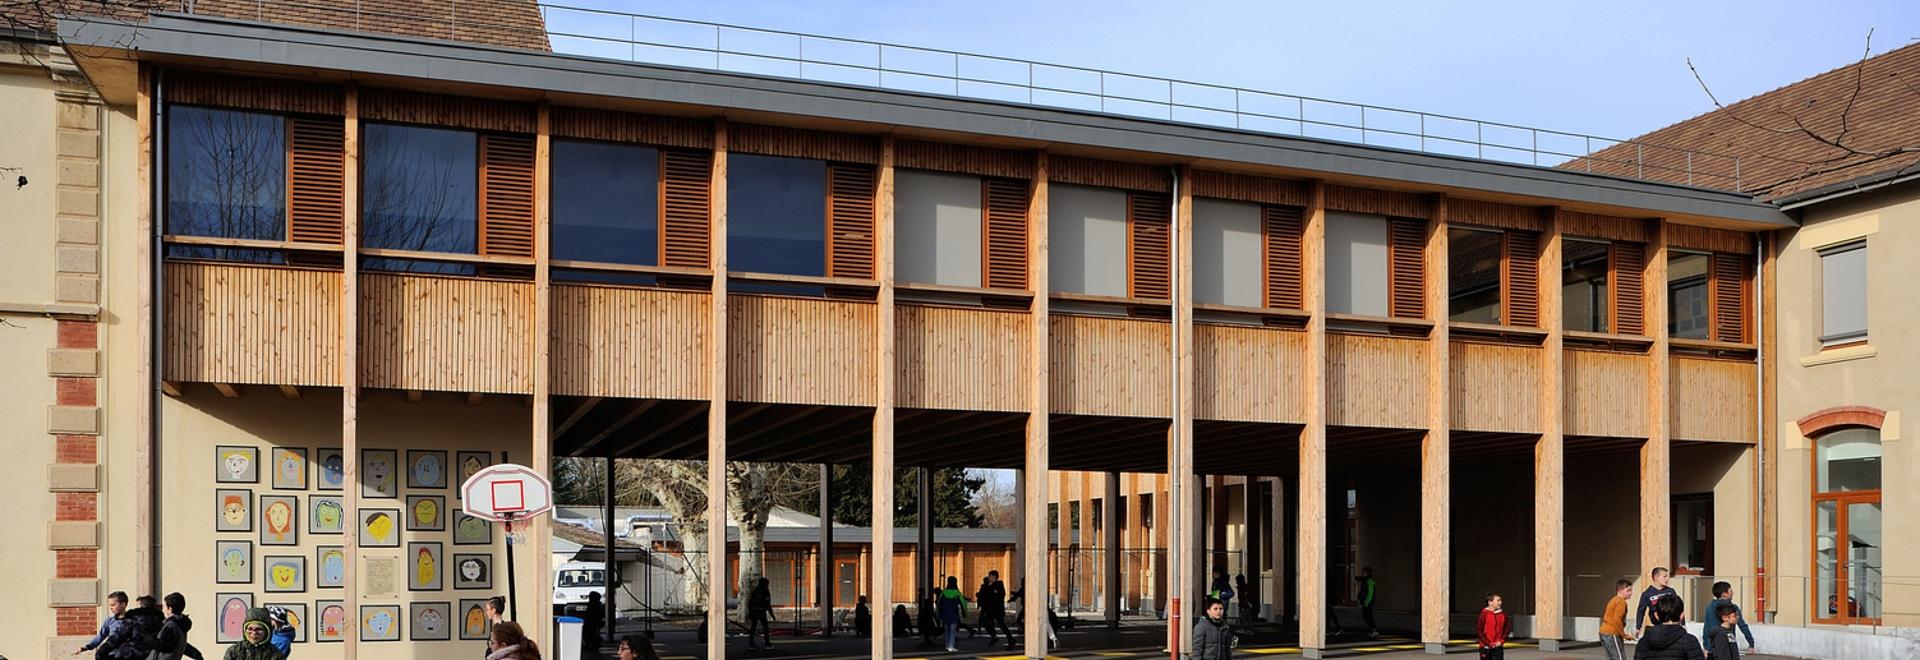 Scuola elementare di Le Grand Lemps France / Brenas Doucerain Architectes